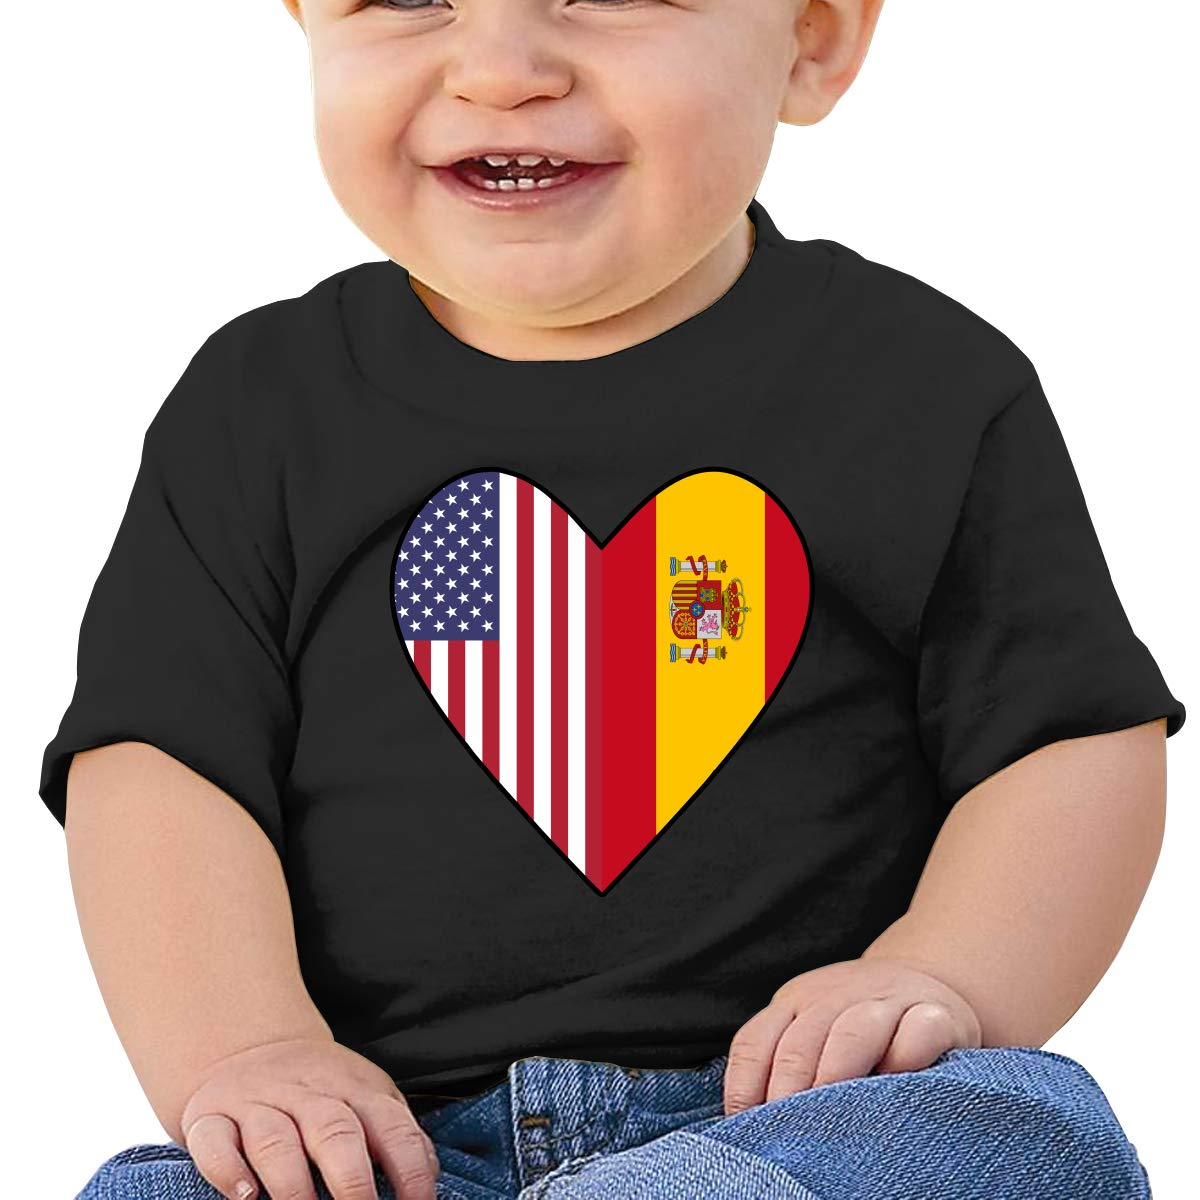 Half Spain Flag Half USA Flag Love Heart Newborn Baby Short Sleeve Crewneck T-Shirt 6-18 Month Tops